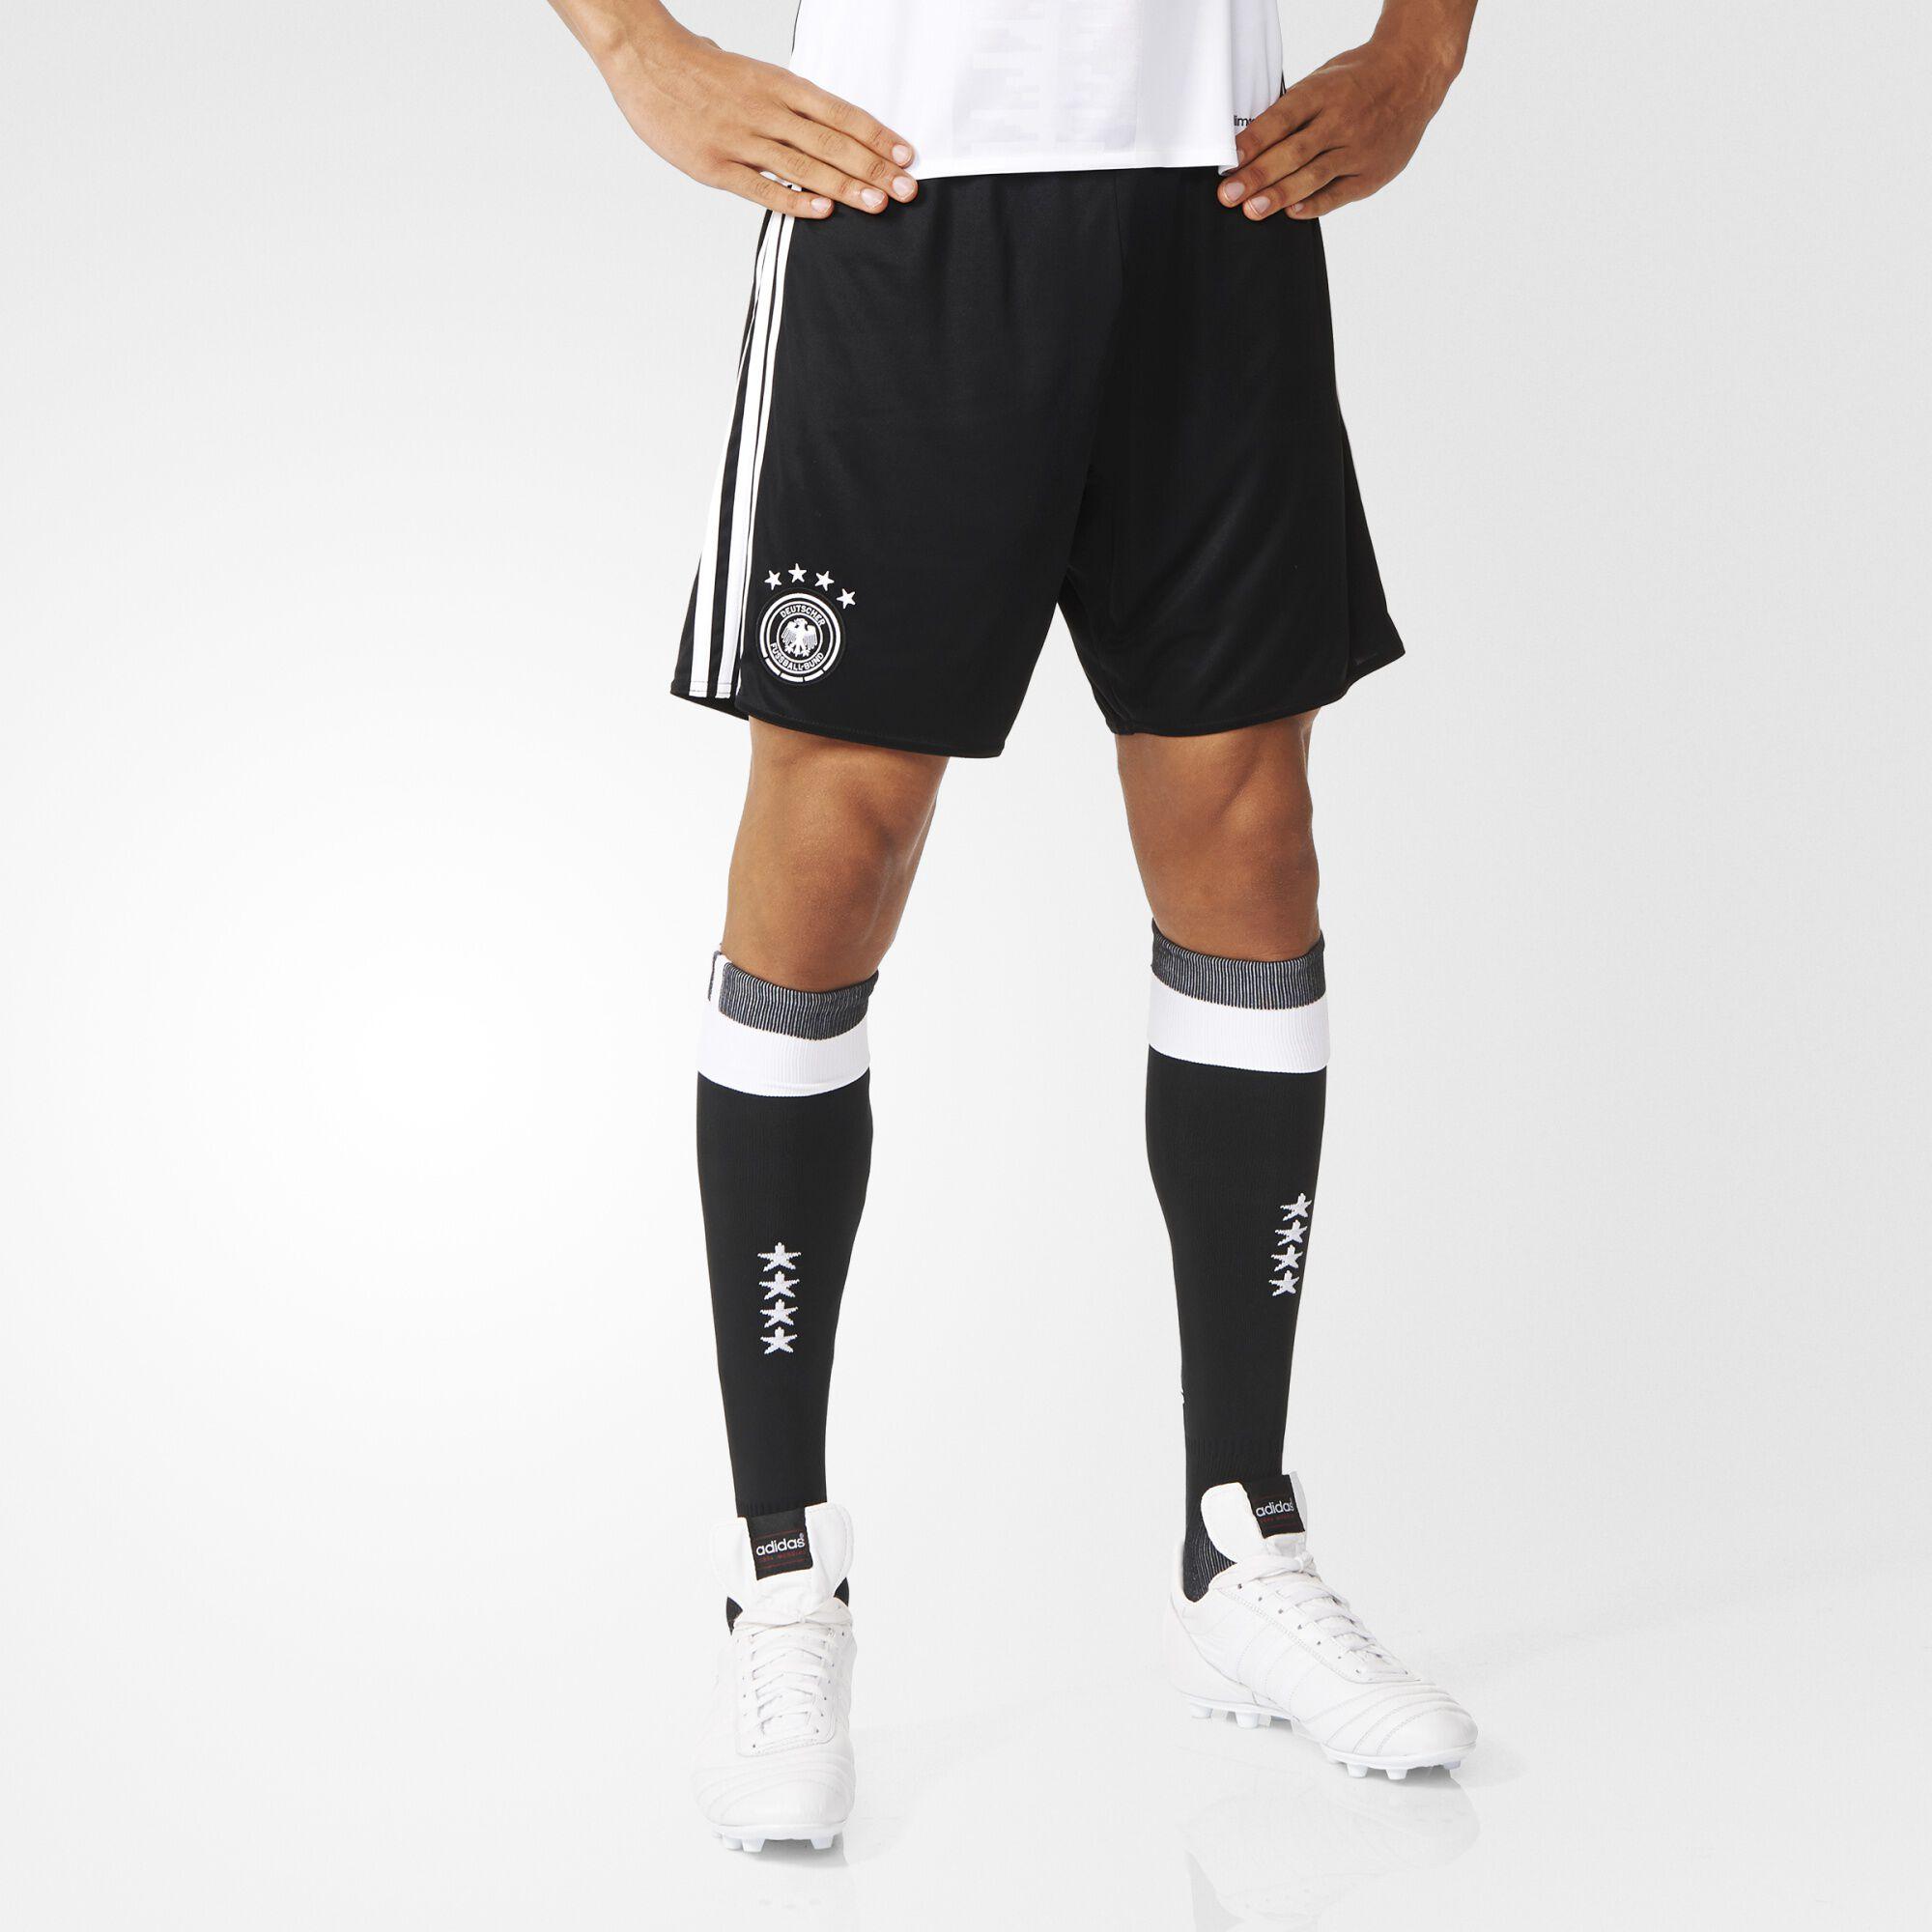 Uefa euro 2016 germany home replica player shorts for Replica mobel deutschland